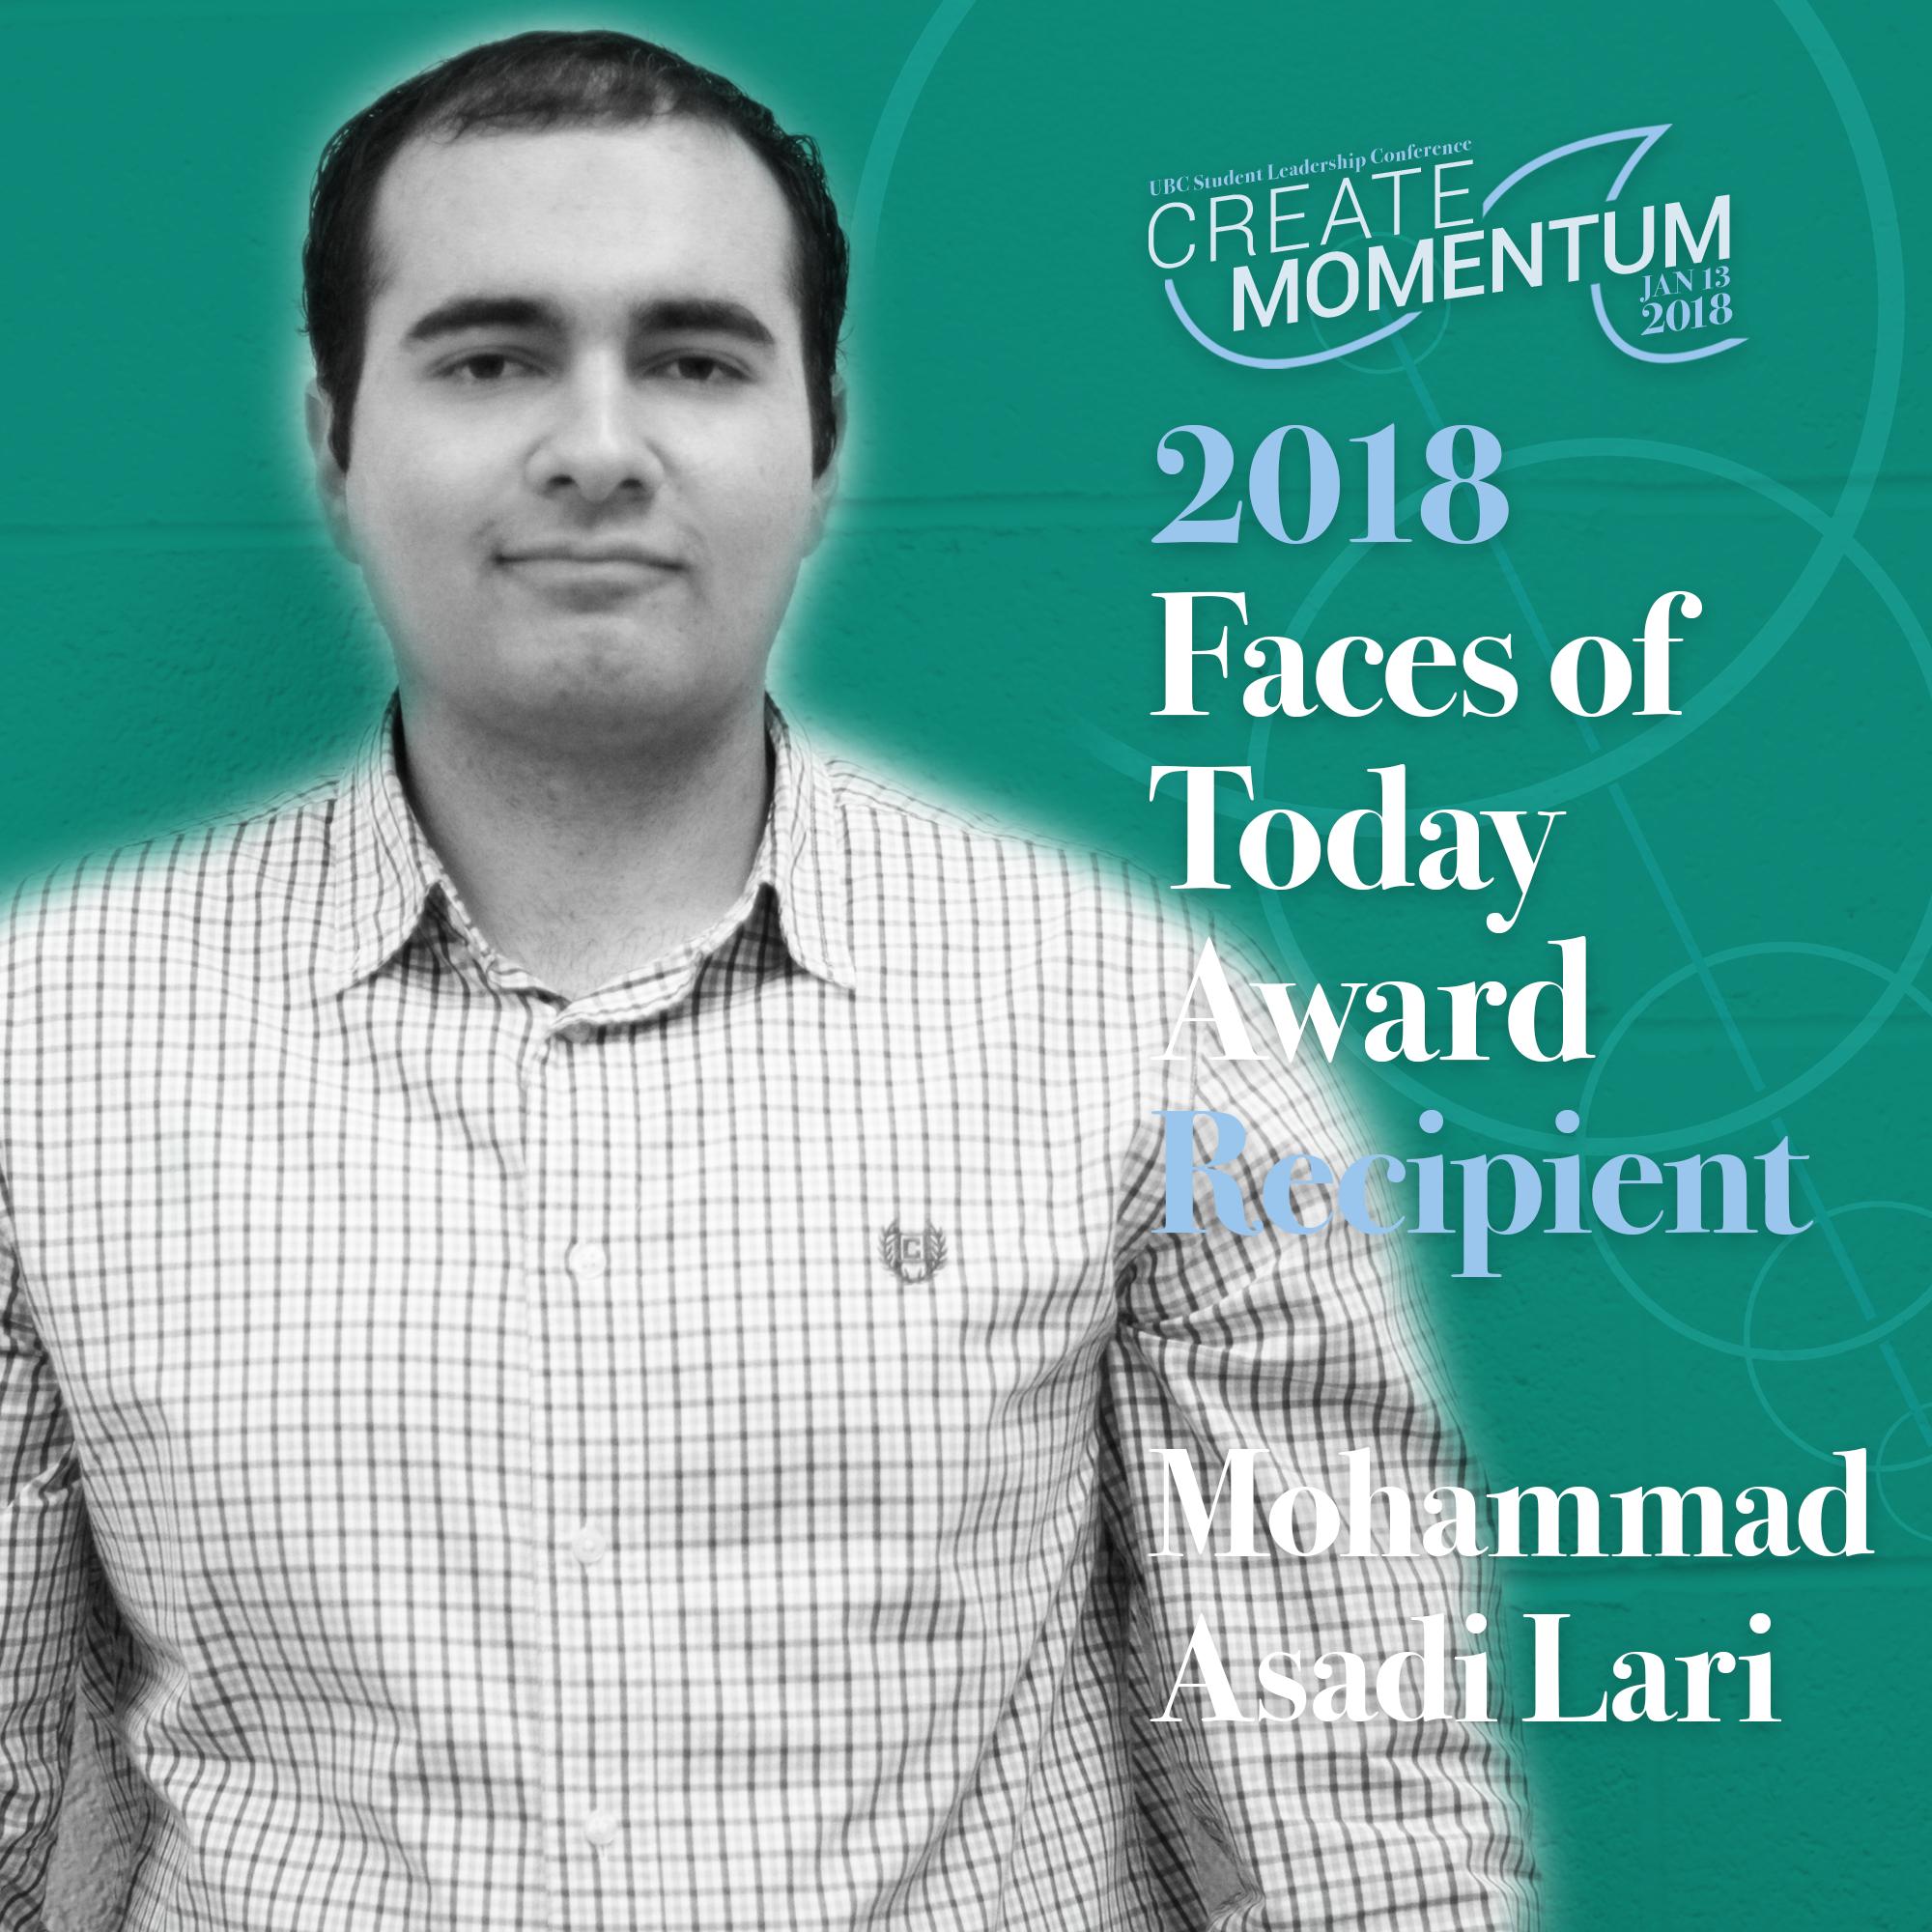 SLC Faces of Today Mohammad Asadi Lari